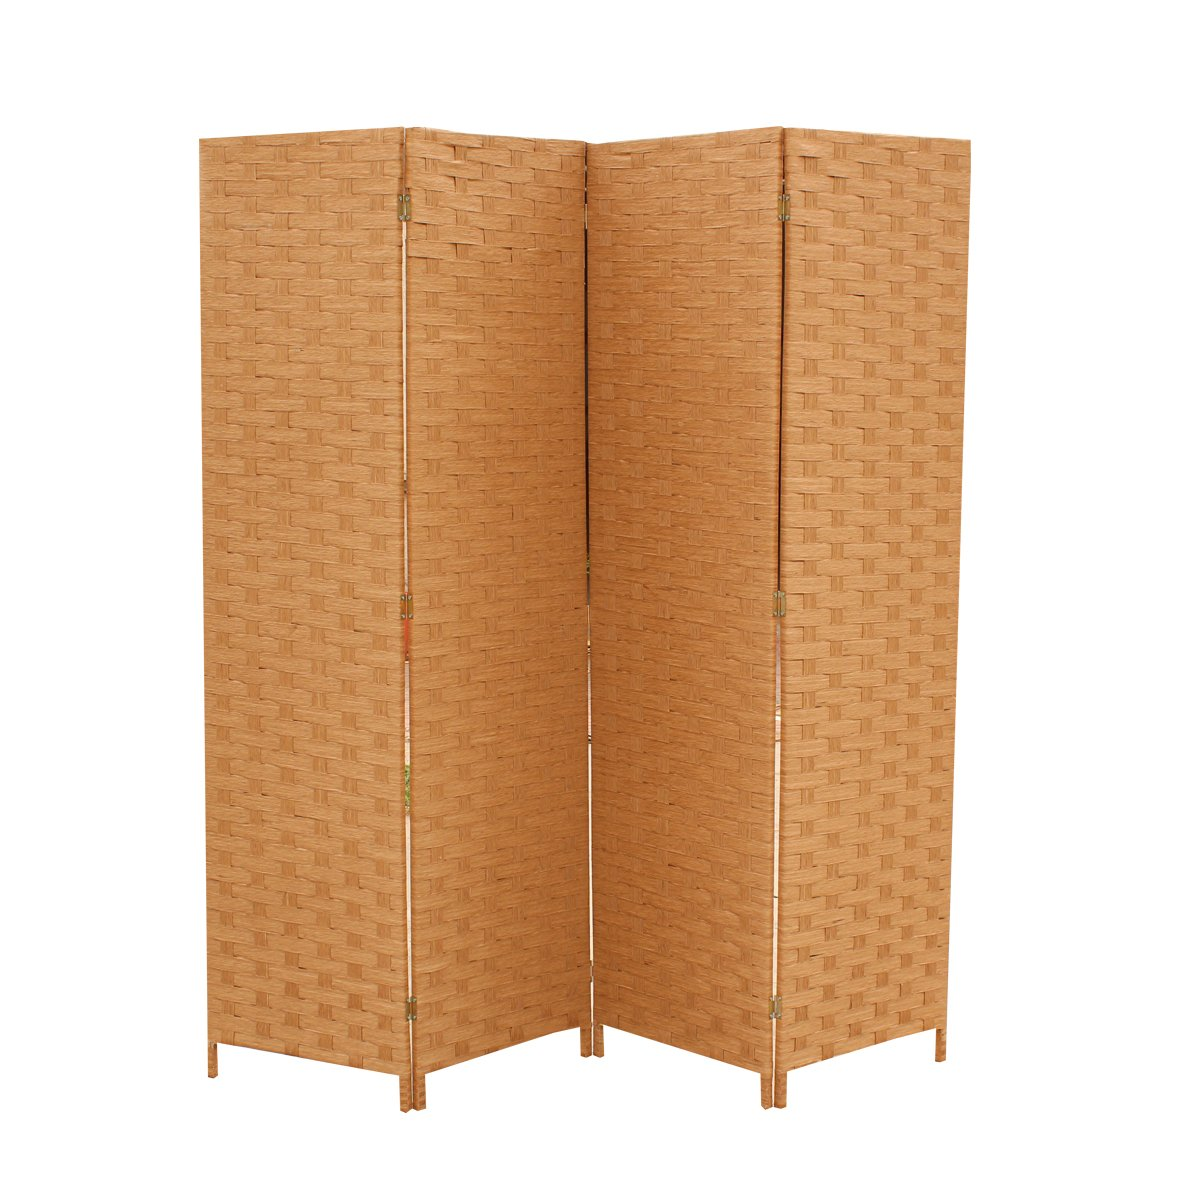 4 Panel Folding Wooden Screen Room Divider Wood Mesh Woven Design Best Massage